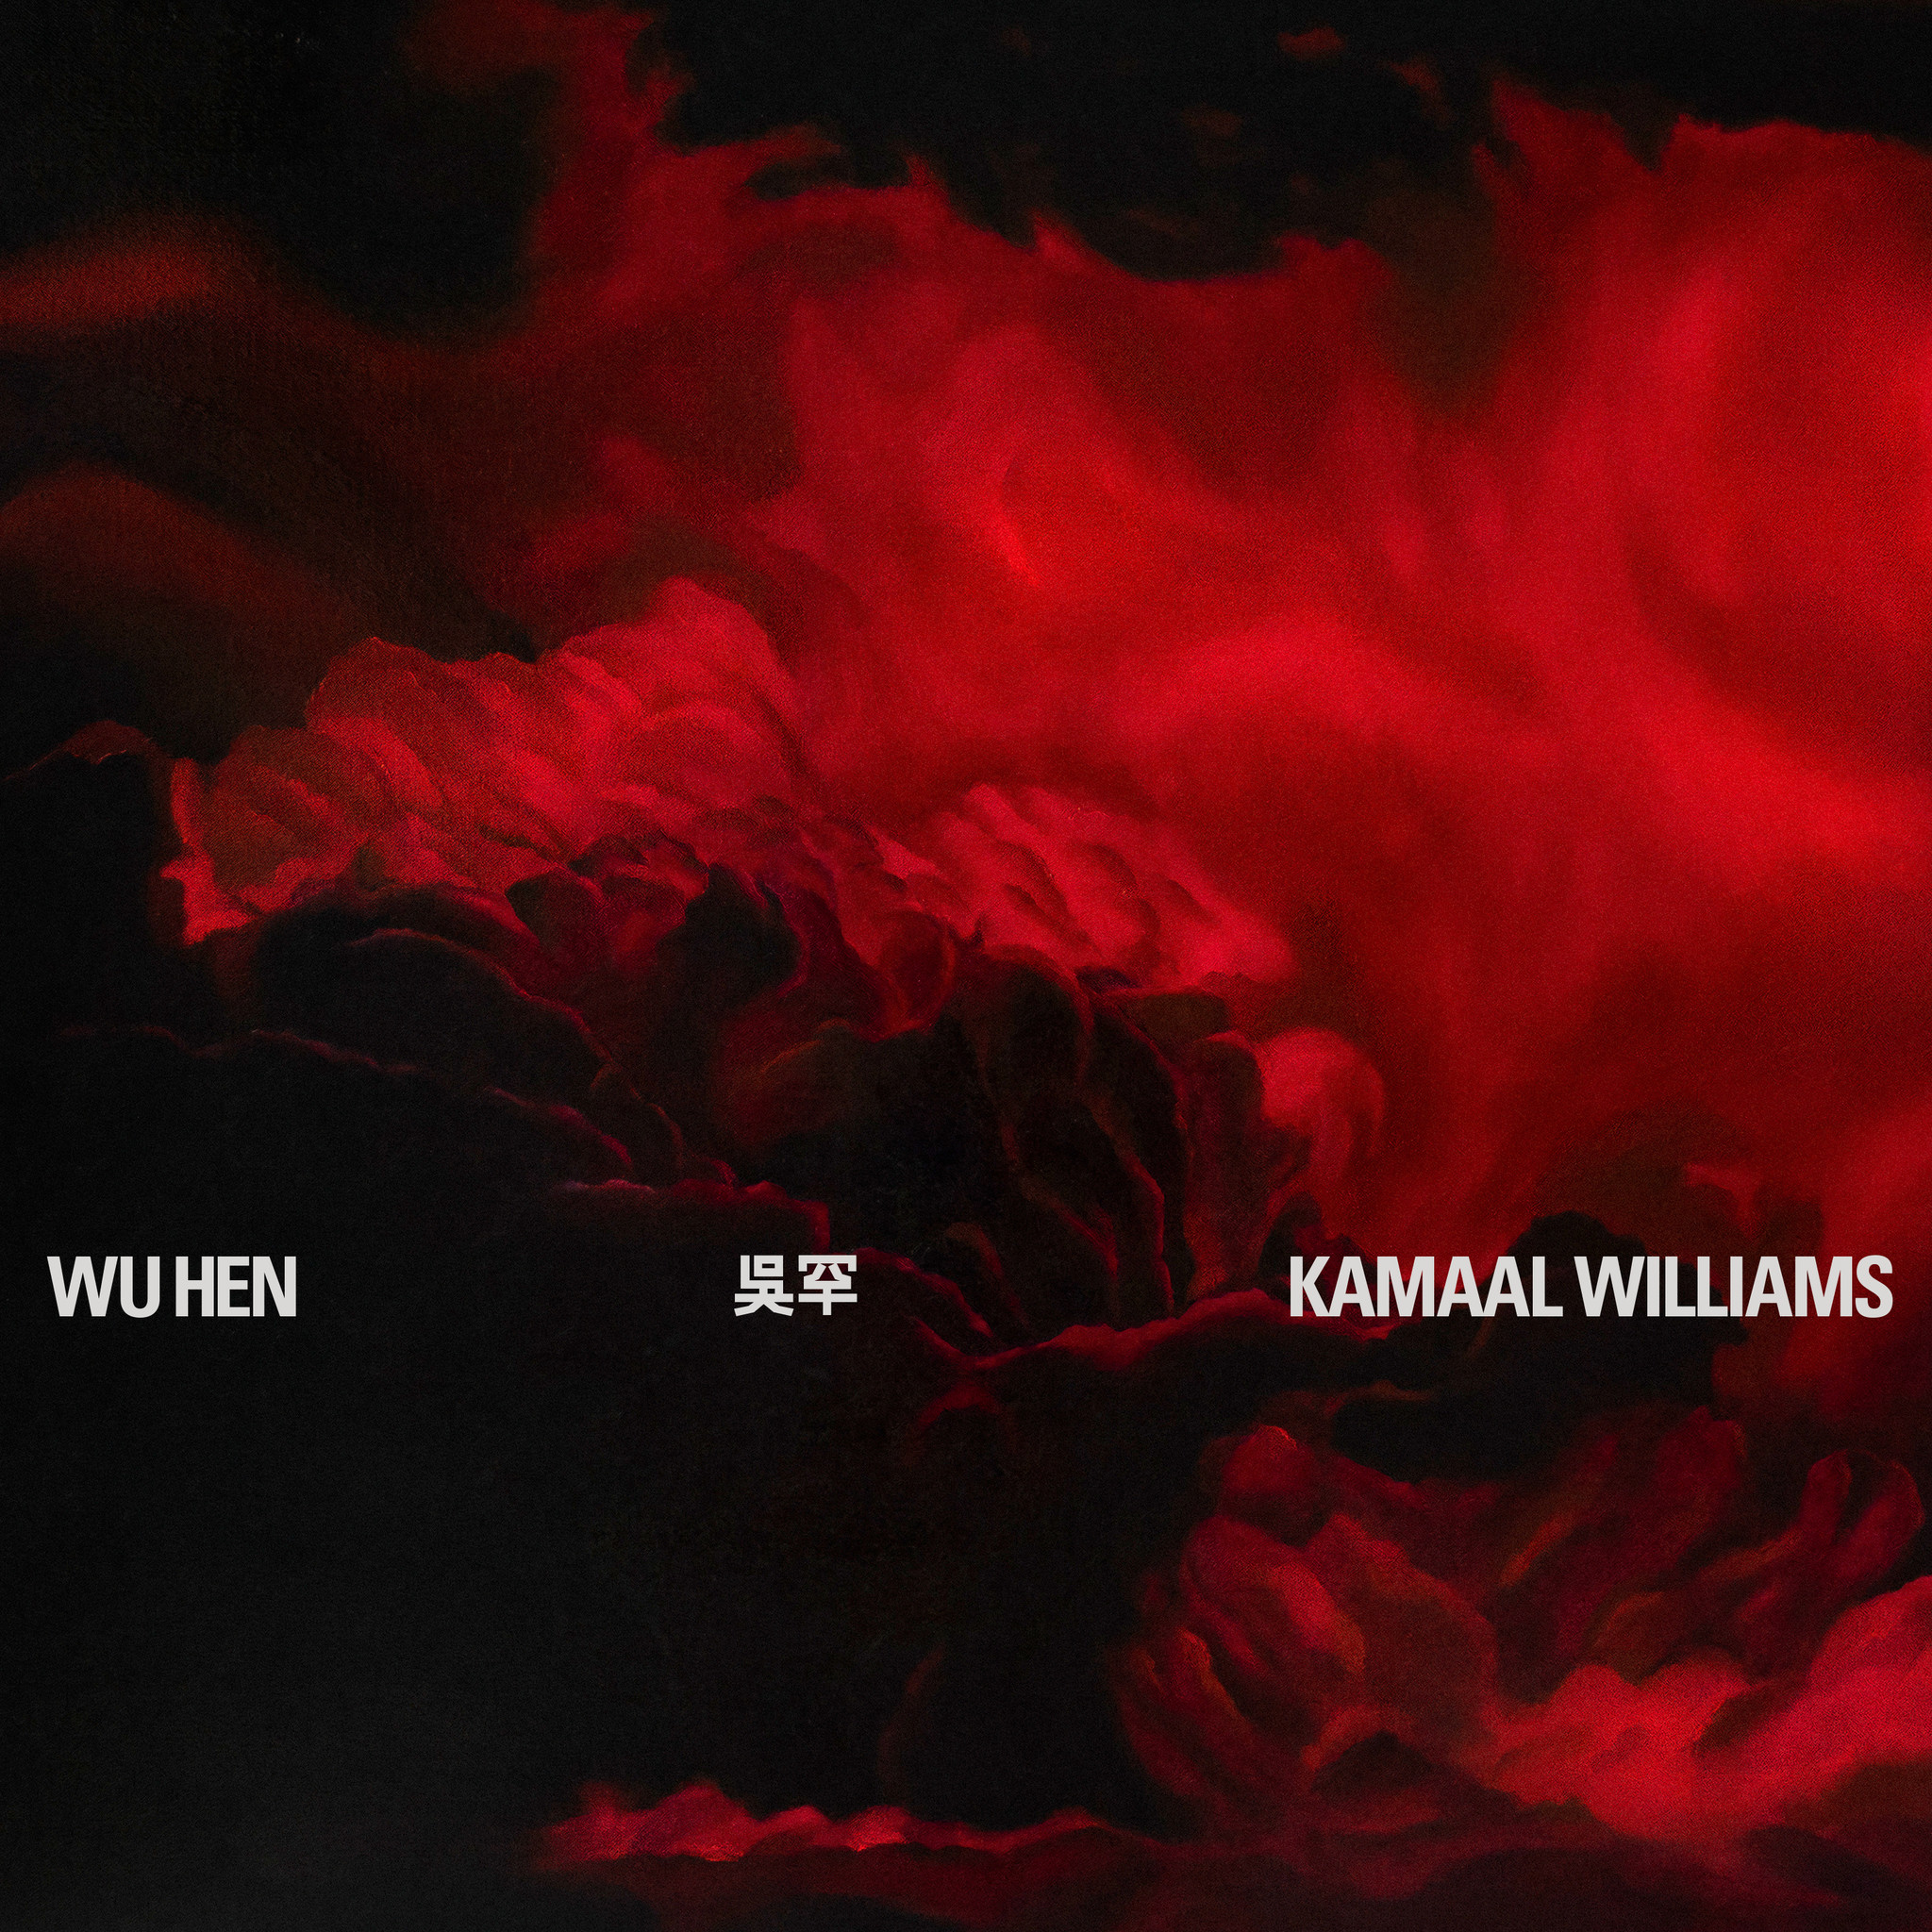 Black Focus Kamaal Williams - Wu Hen